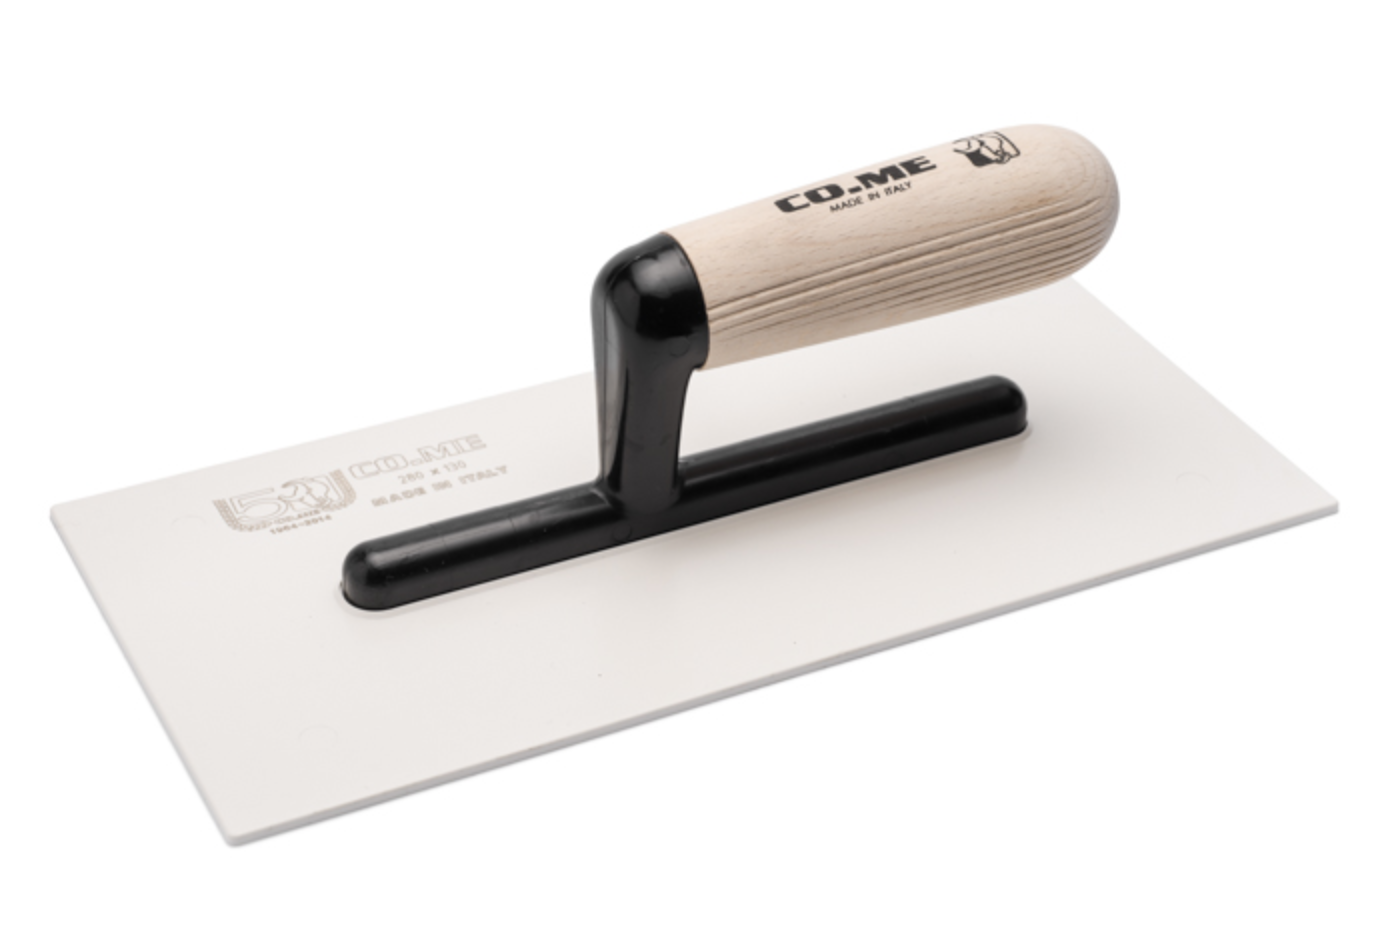 330-PVC/ABS trowel wood handle (non-bevel edge)